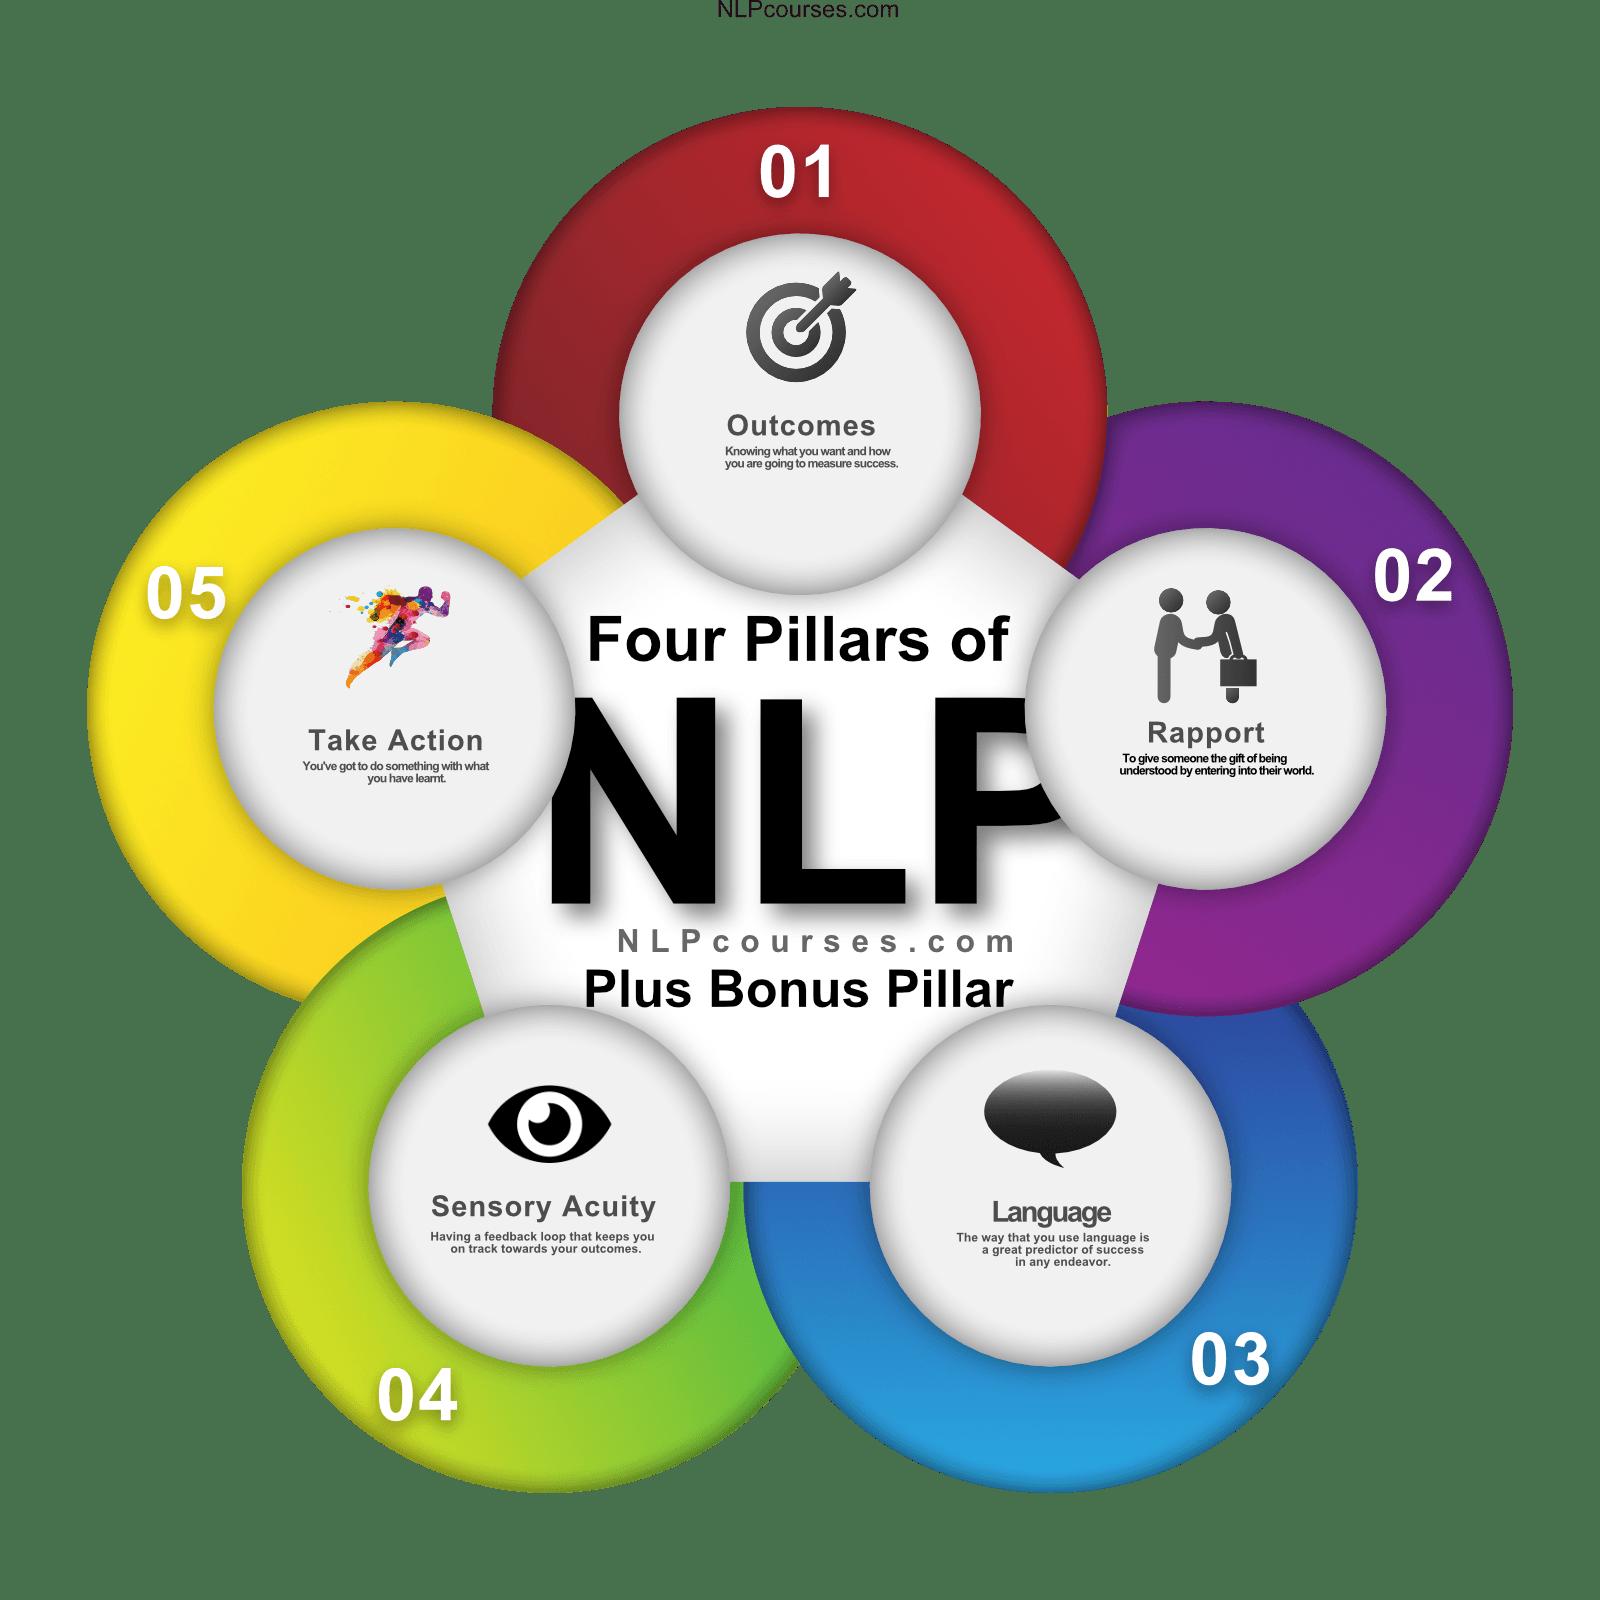 4 pillars of nlp - NLP Courses - Home of NLP Training